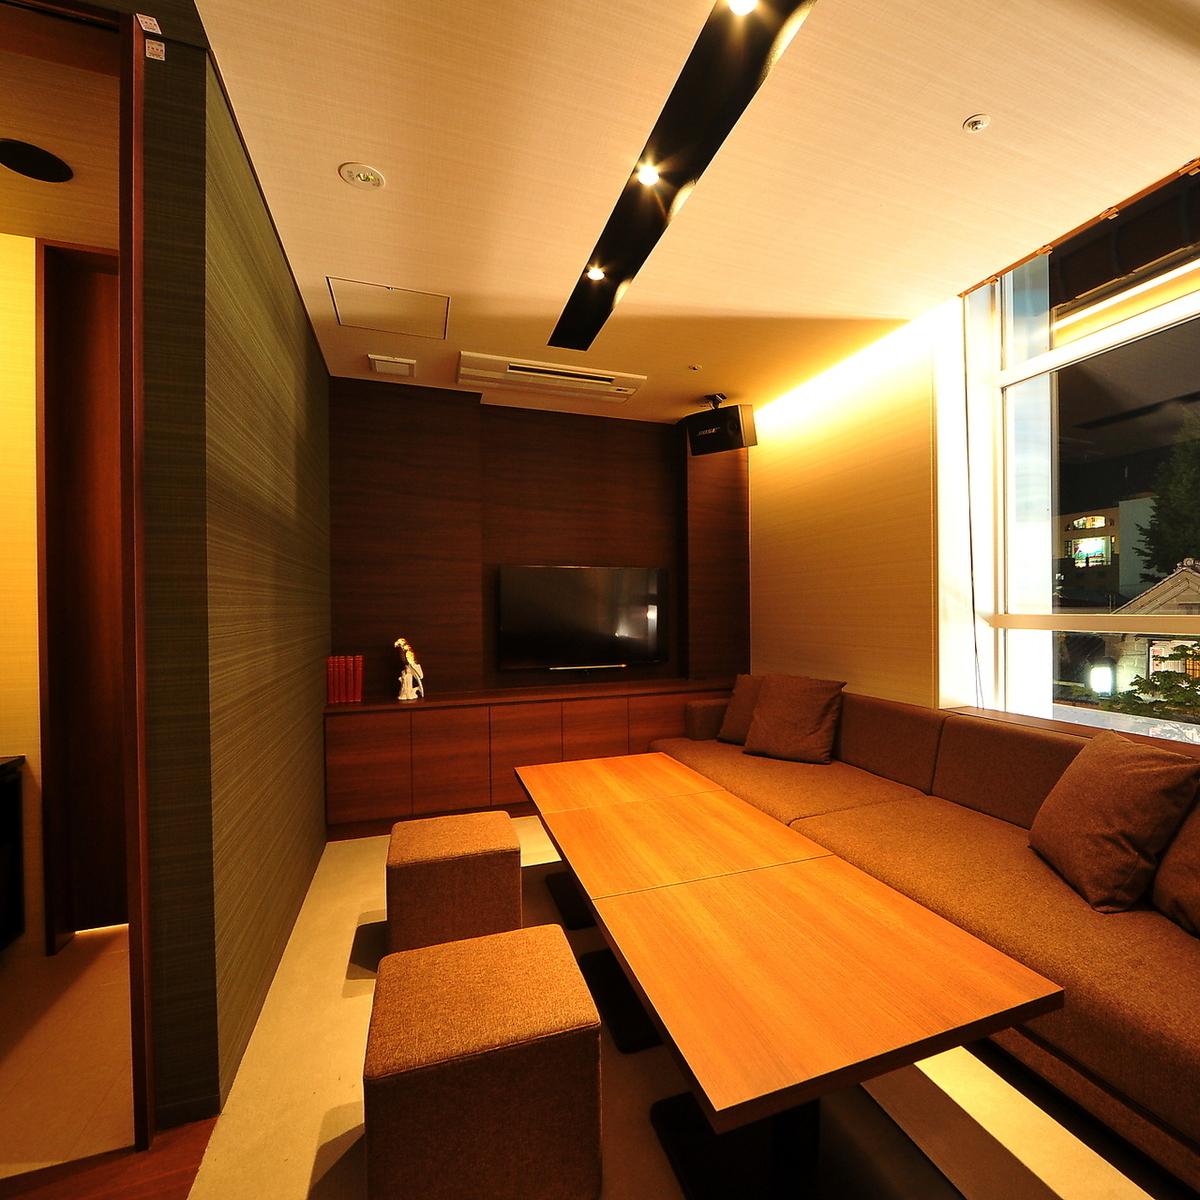 【VIP ROOM 011】私人包房最多可容納5人/私人類型融合了寬敞典雅的現代風格。配備衛生間。你可以廣泛使用它。